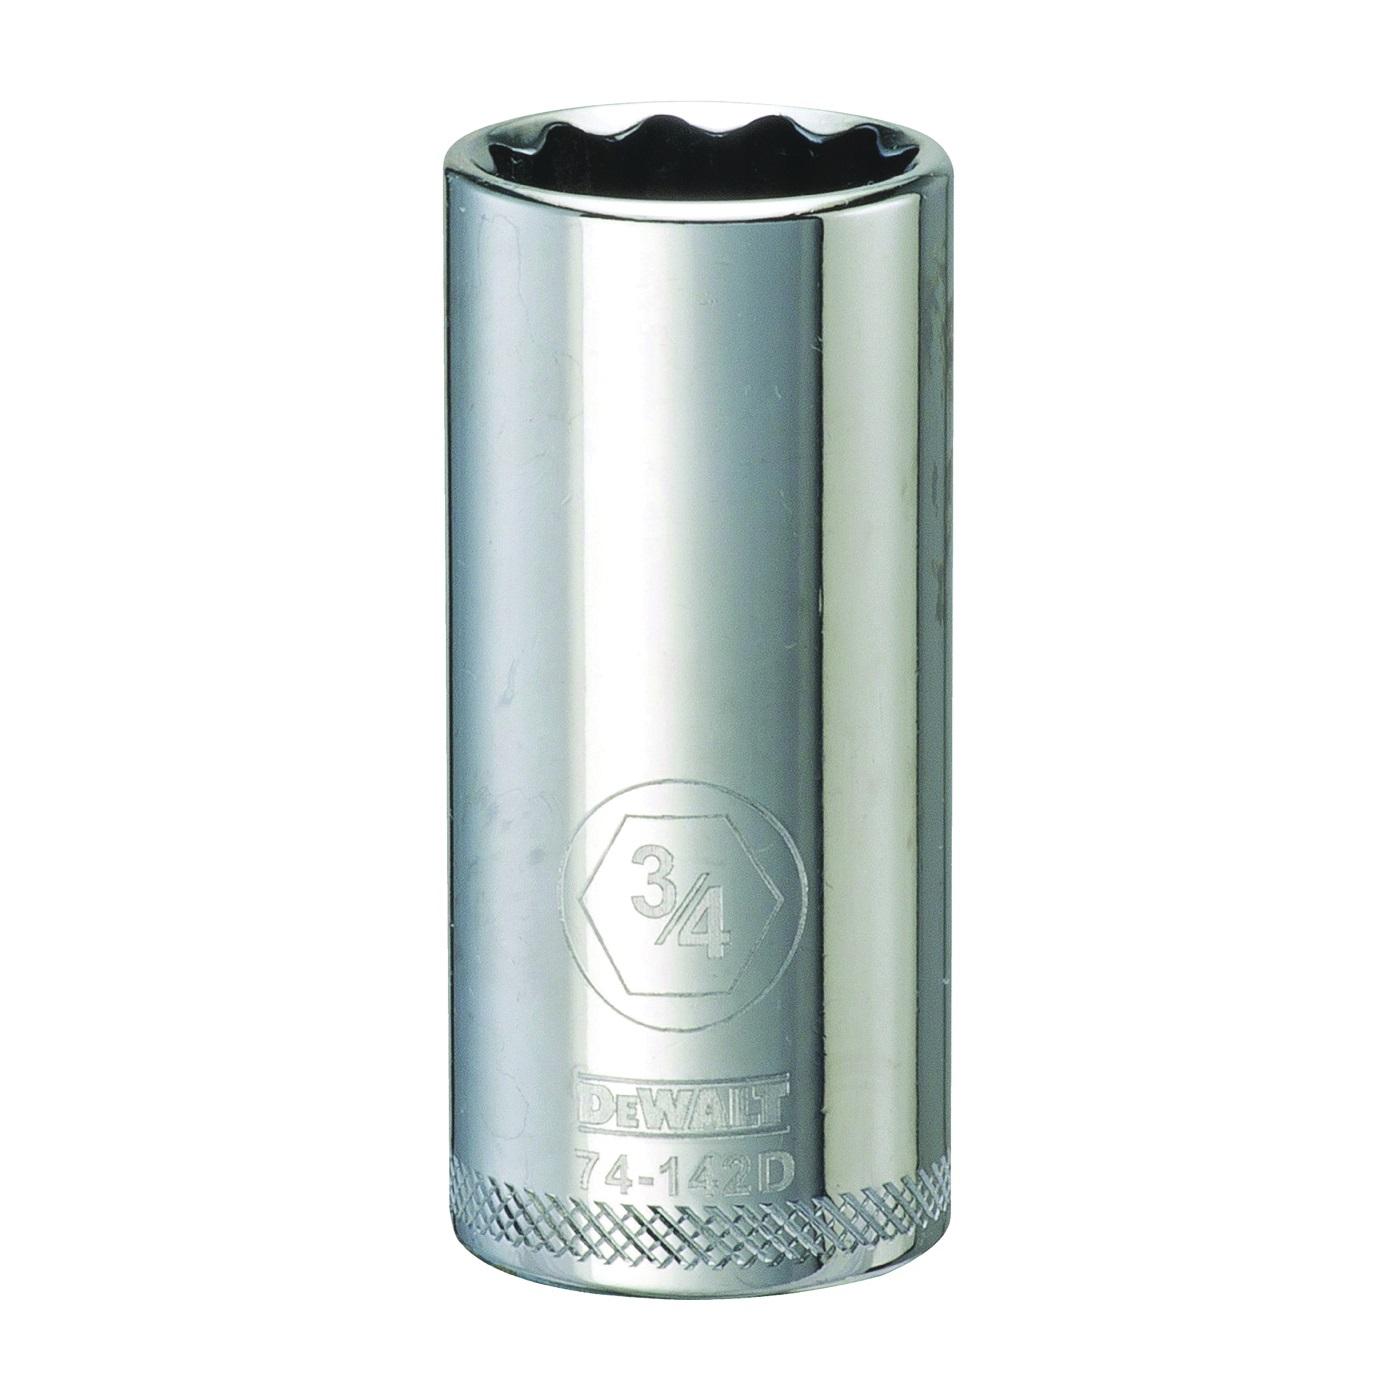 Picture of DeWALT DWMT74142OSP Drive Socket, 3/4 in Socket, 3/8 in Drive, 12 -Point, Vanadium Steel, Polished Chrome